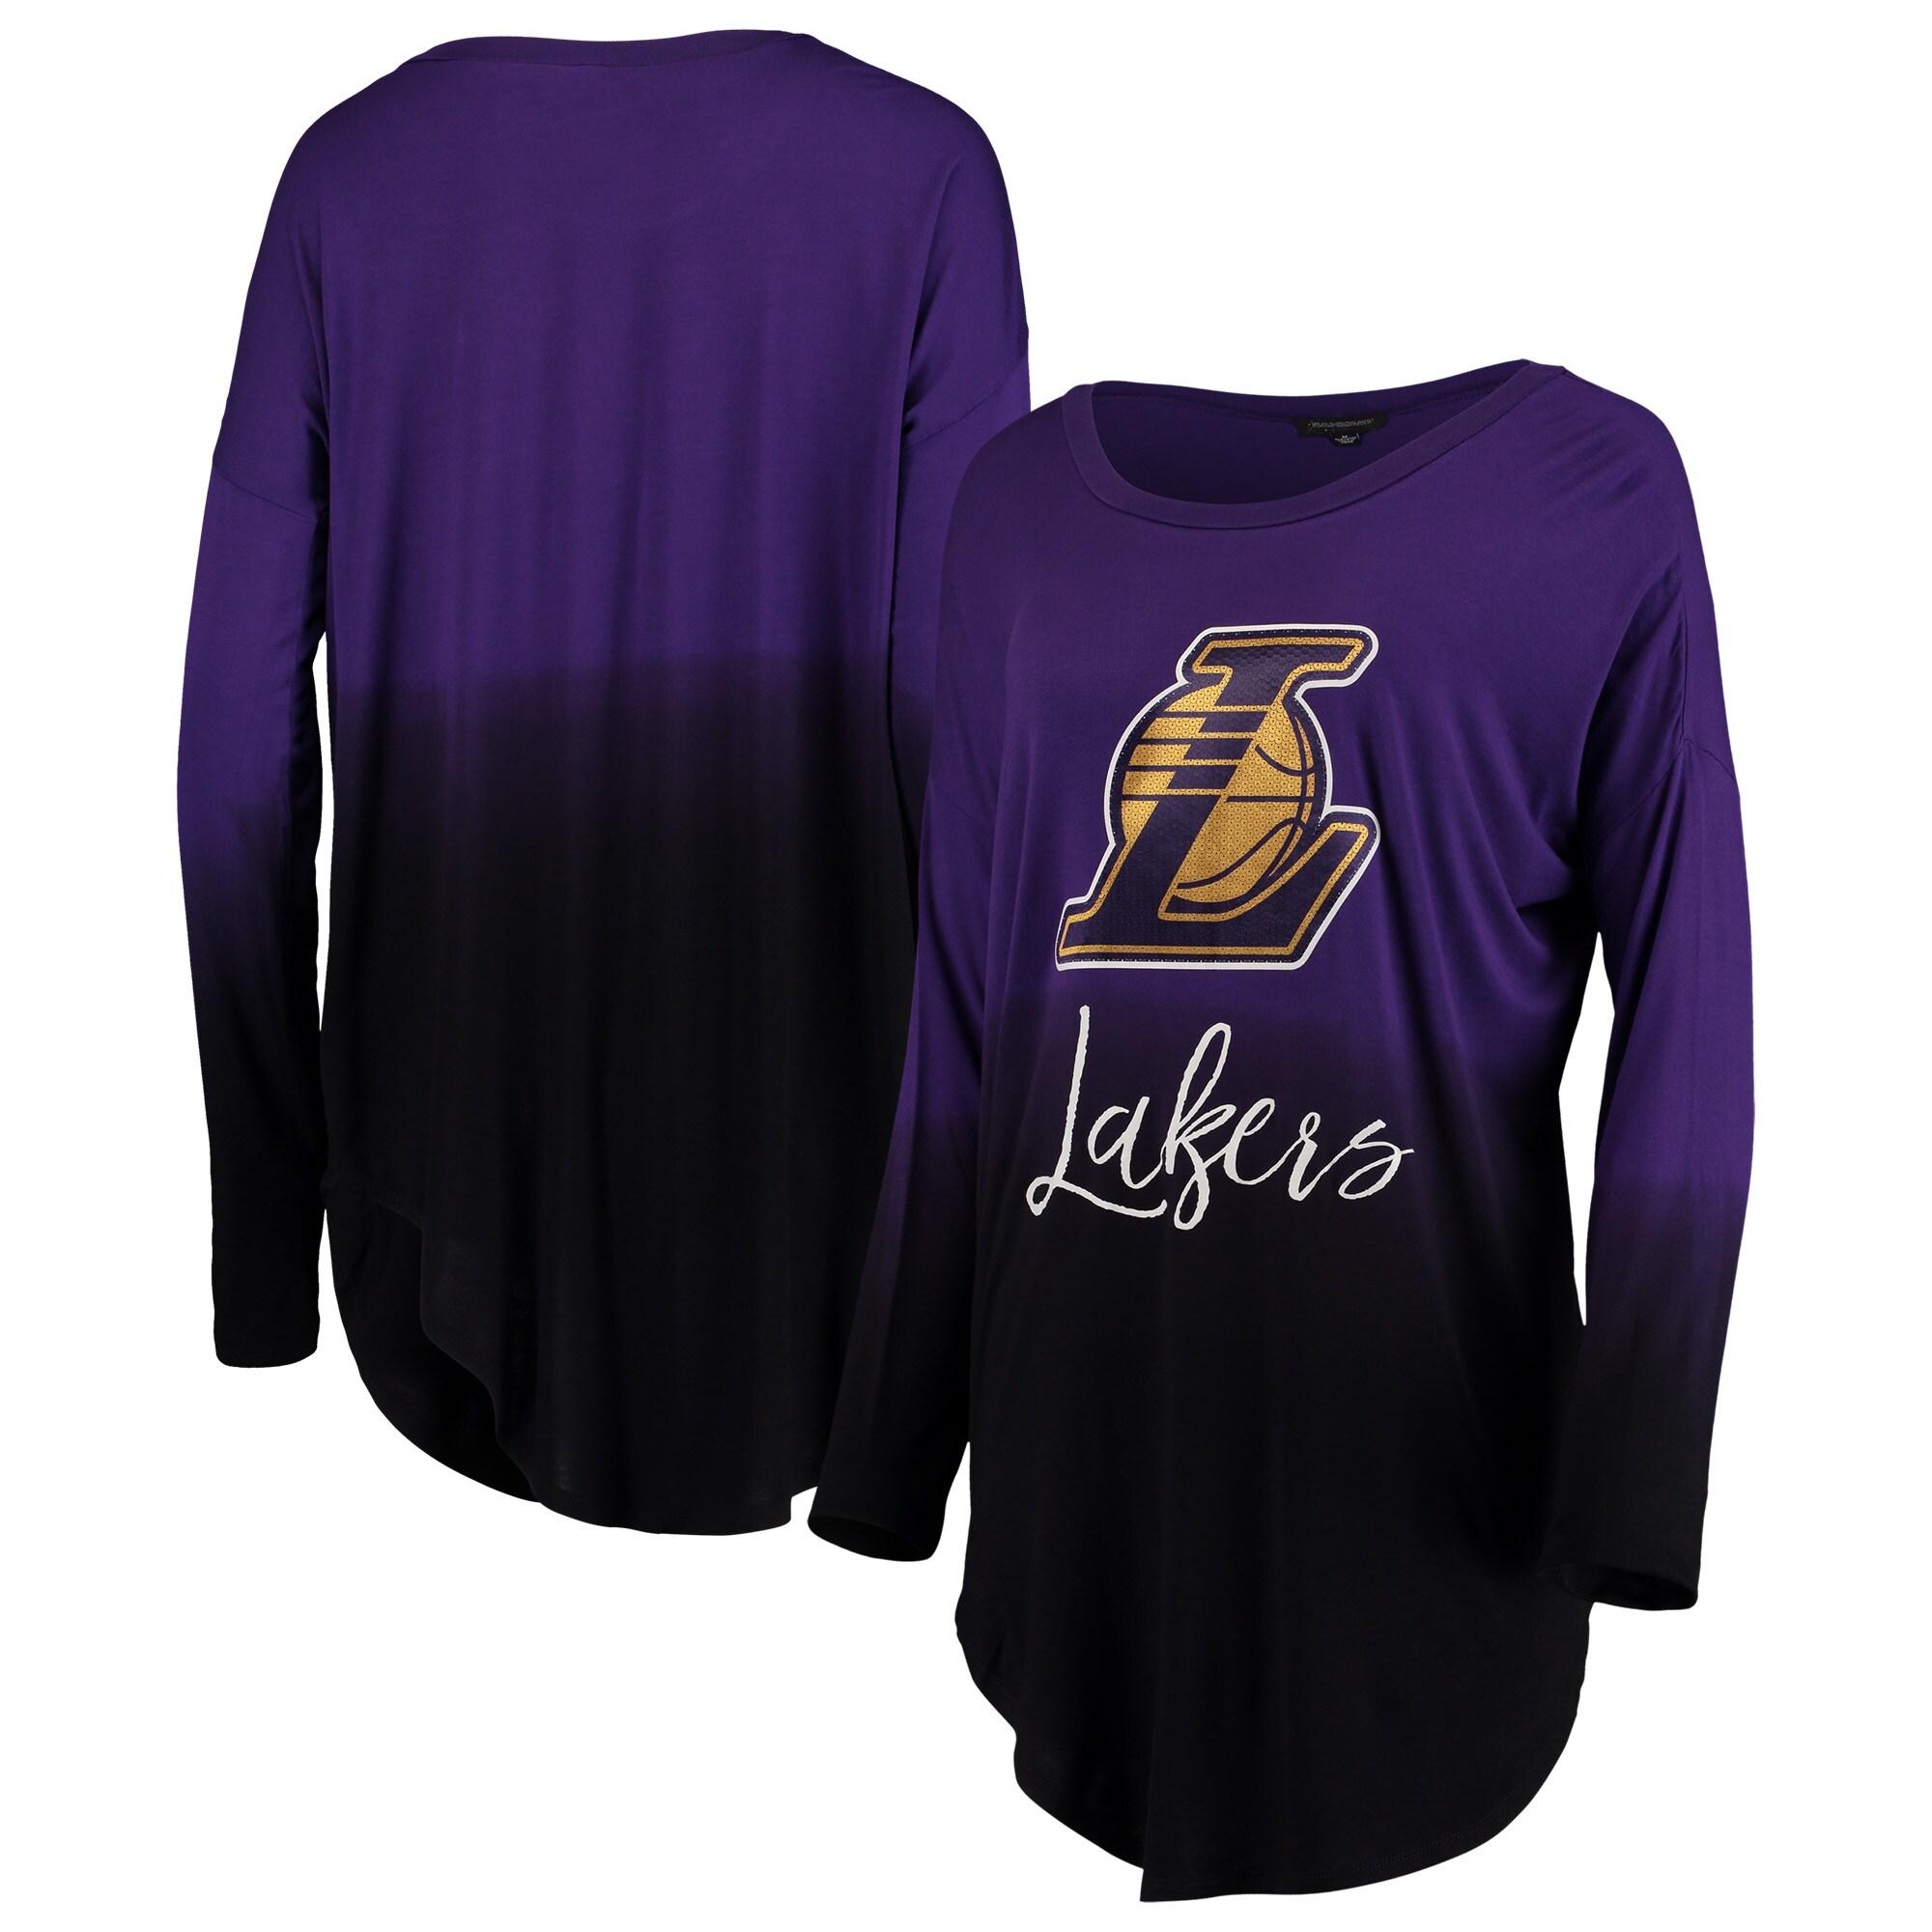 Los Angeles Lakers Women's Own It Ombre Long Sleeve Tunic T-Shirt - Purple